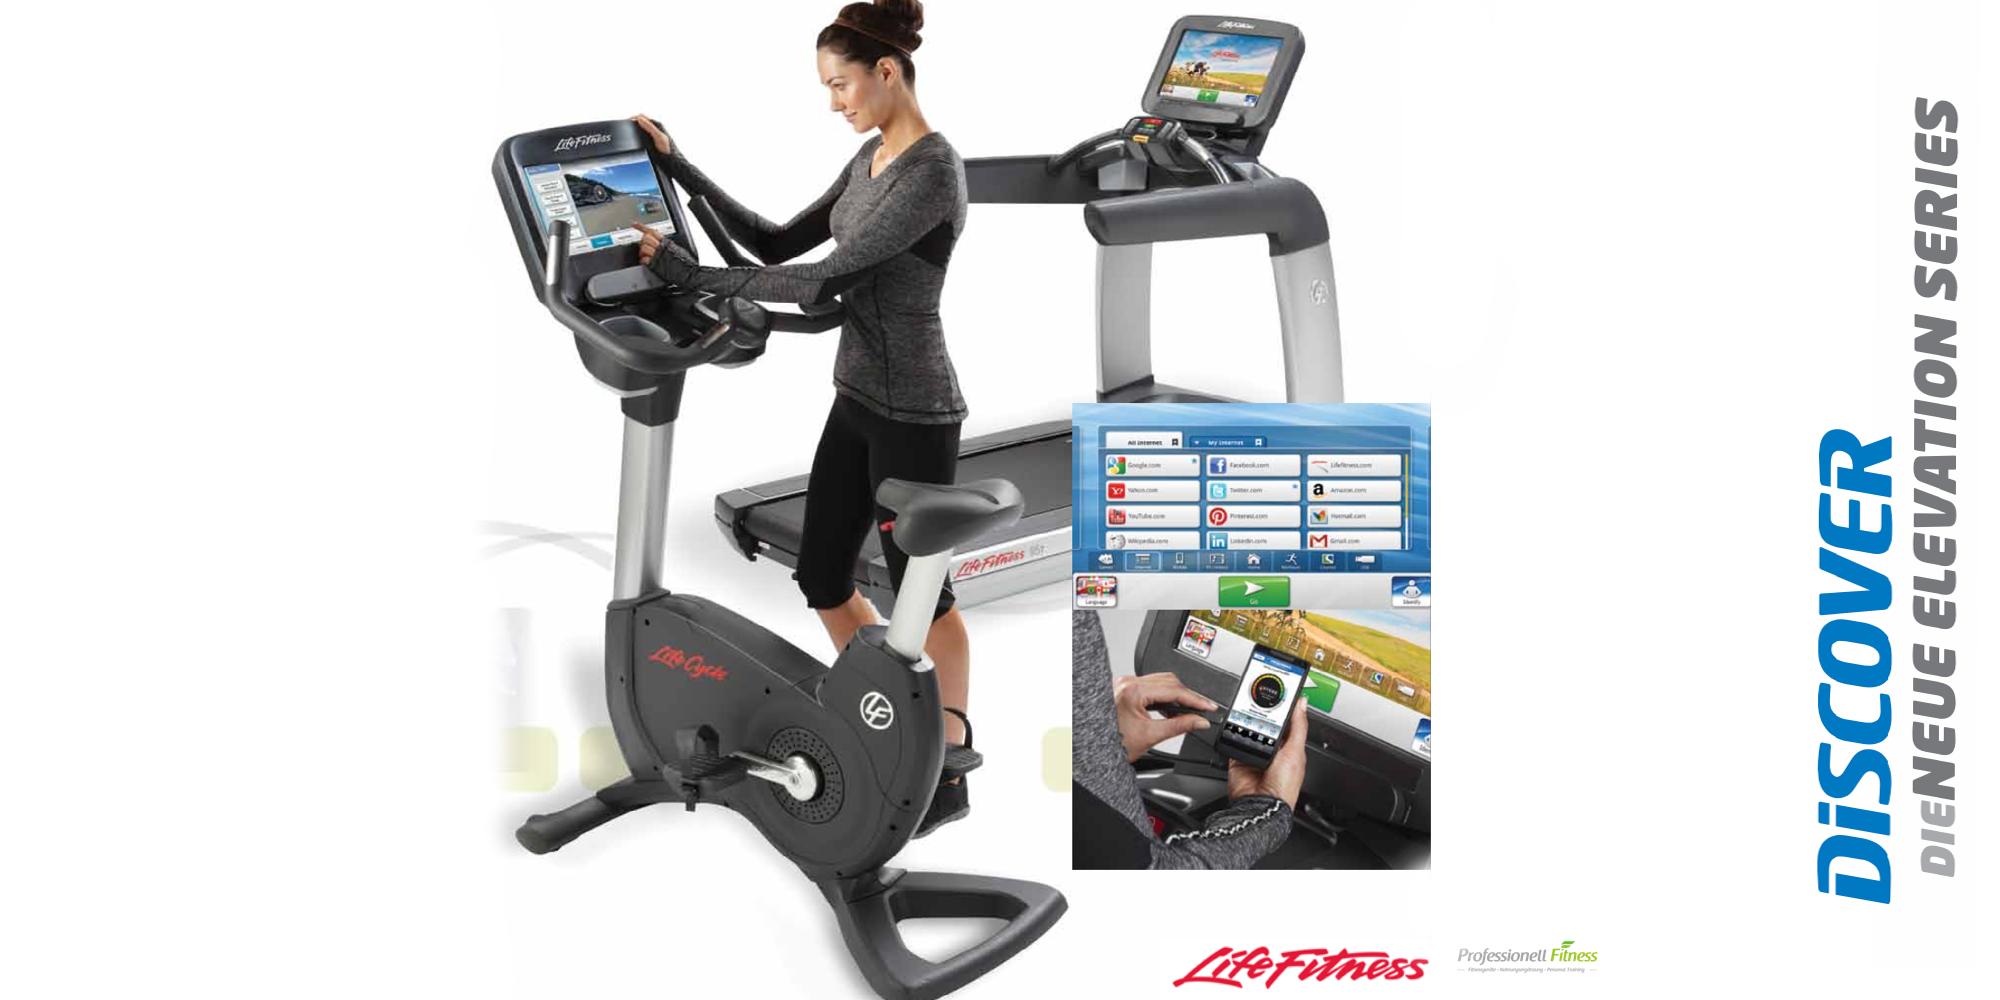 ergometer-multimdia-life-fitness